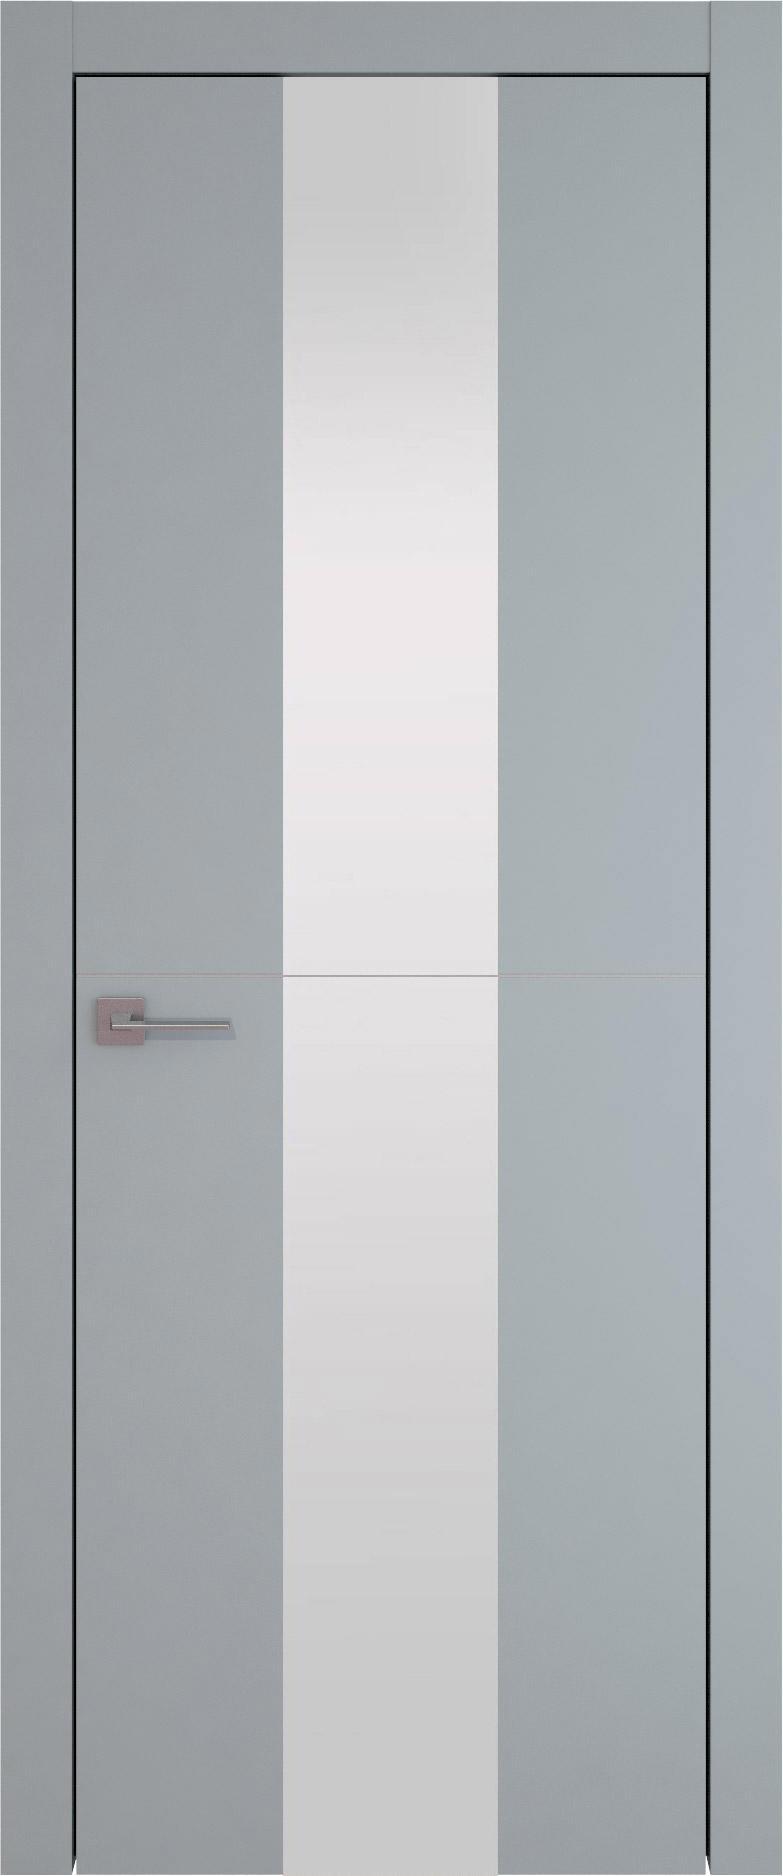 Tivoli Ж-3 цвет - Серебристо-серая эмаль (RAL 7045) Со стеклом (ДО)